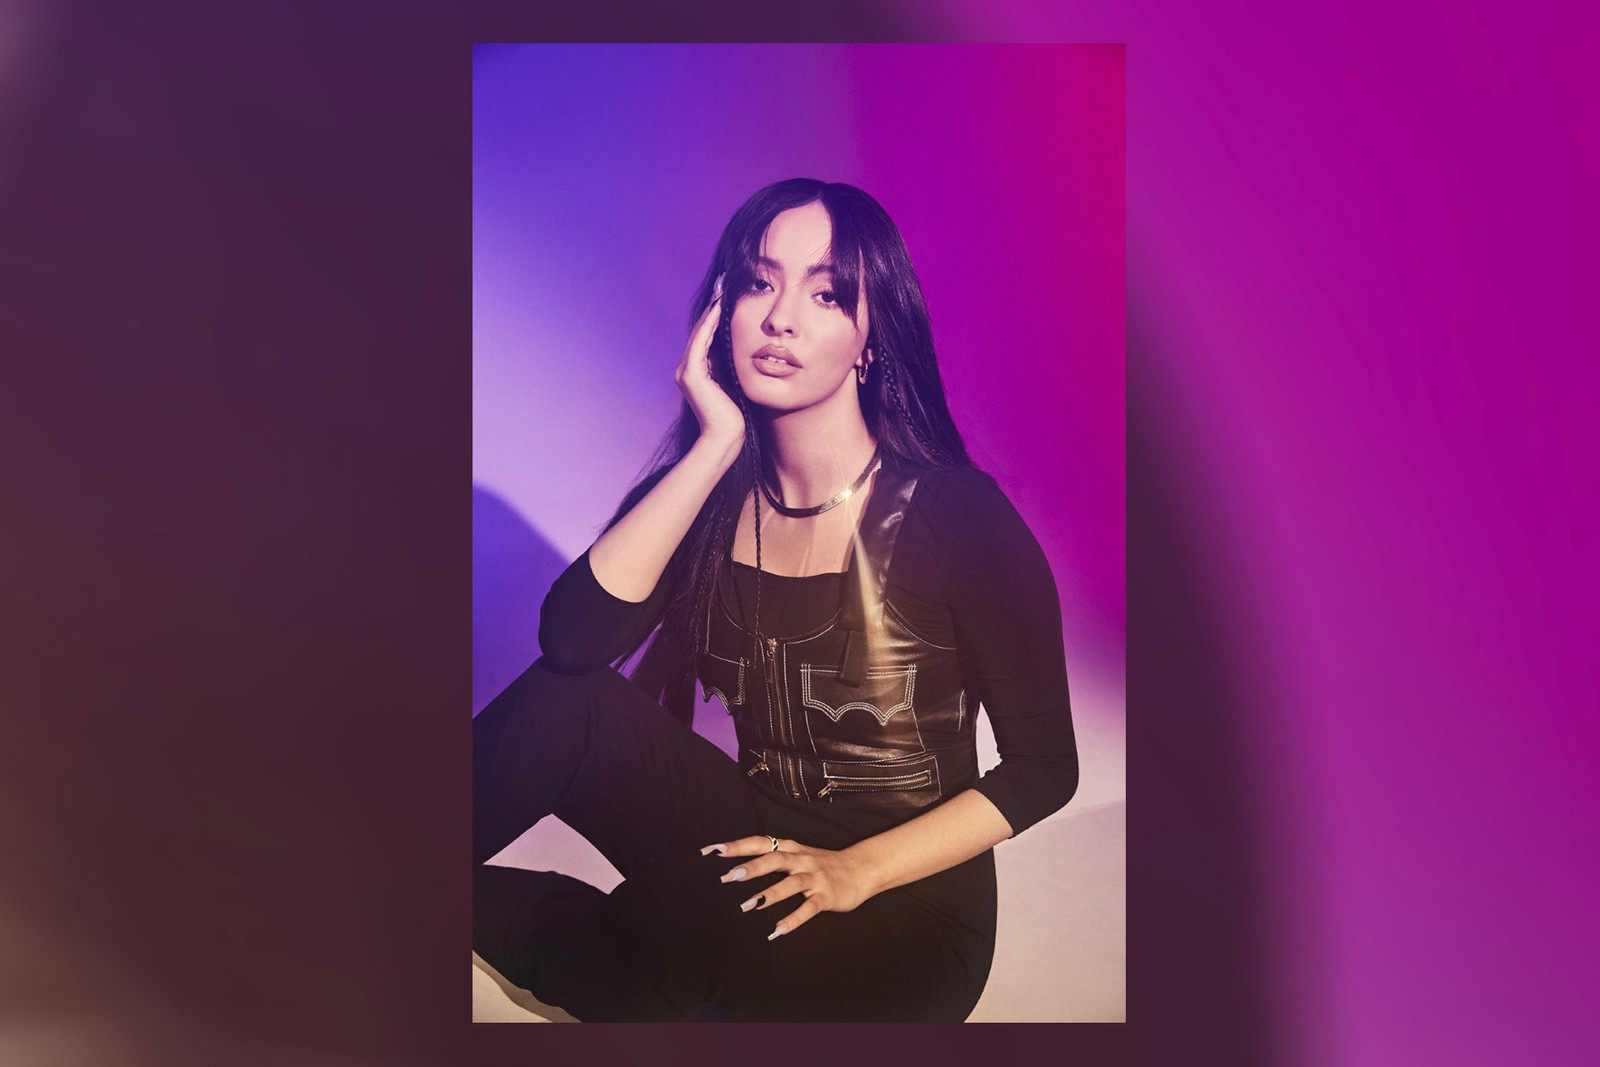 Faouzia Moroccan Canadian Singer Songwriter Music Artist Hero Single Artwork Headband Orange Heels Minefields Stripped